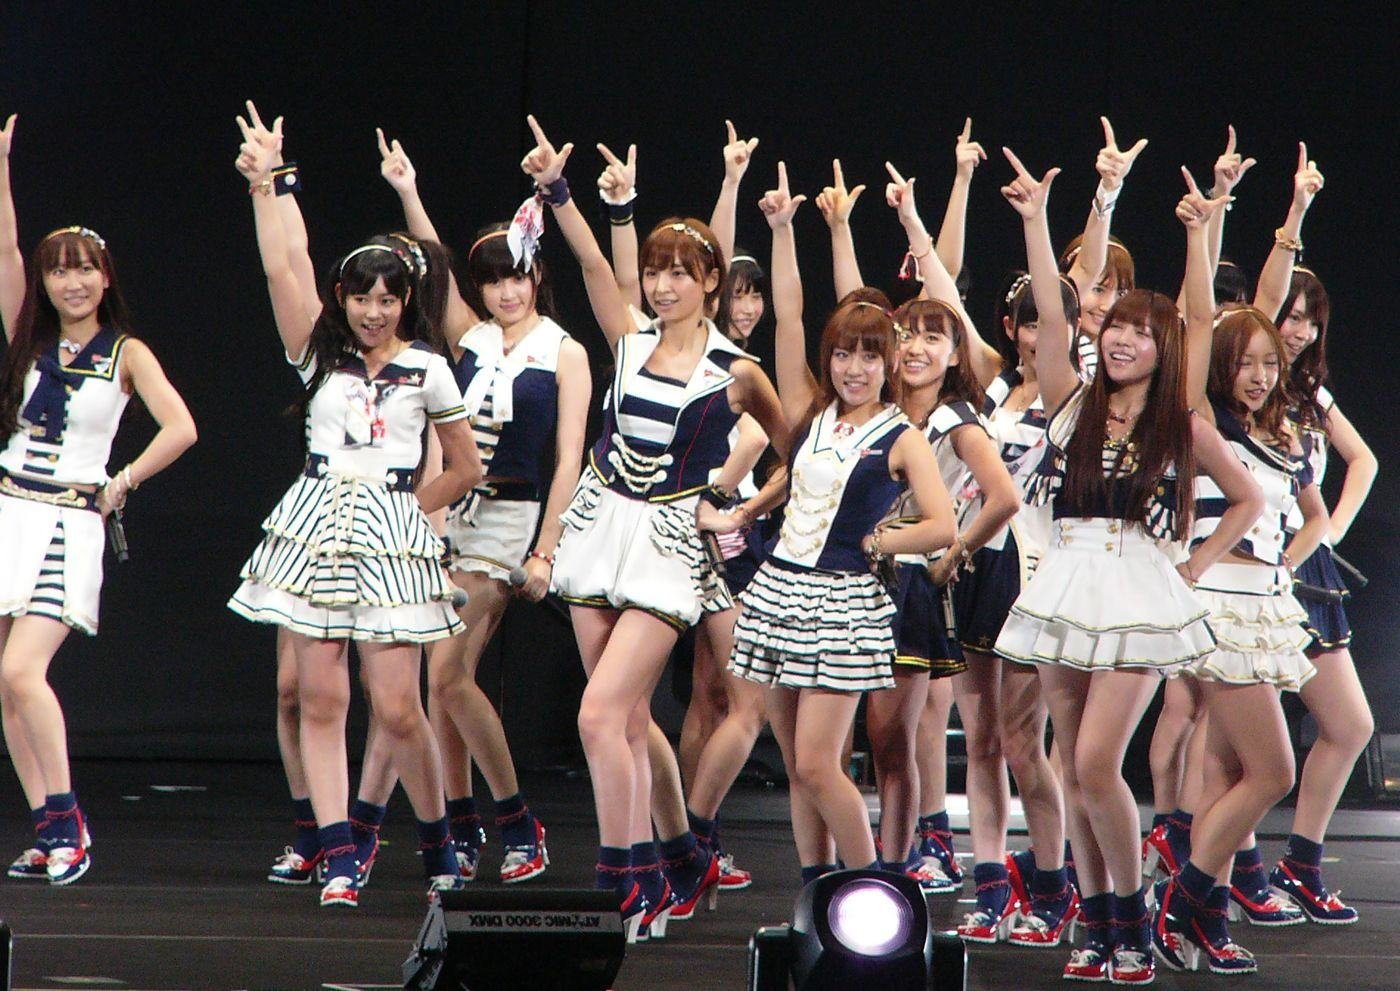 AKB48-3-unohana-the-fanpop-user-35259639-1400-991